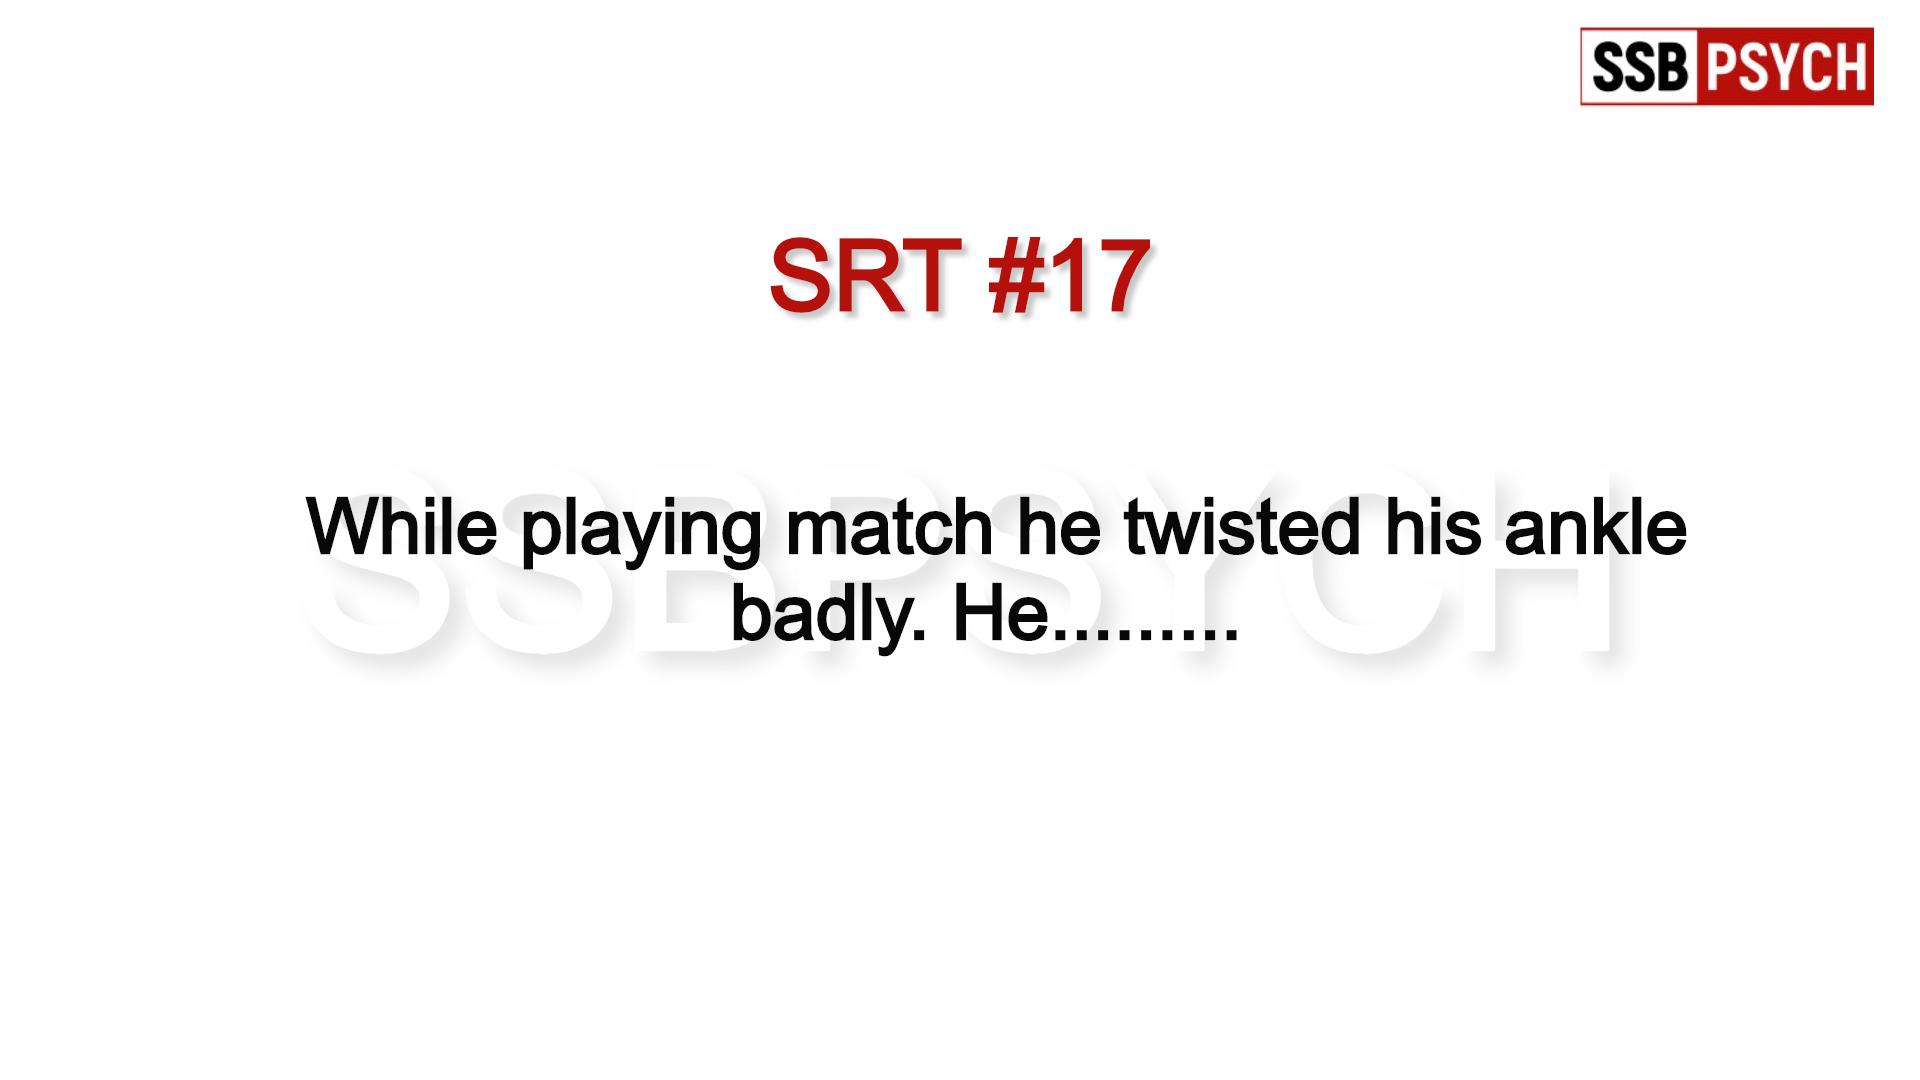 SRT - Situation Reaction Test